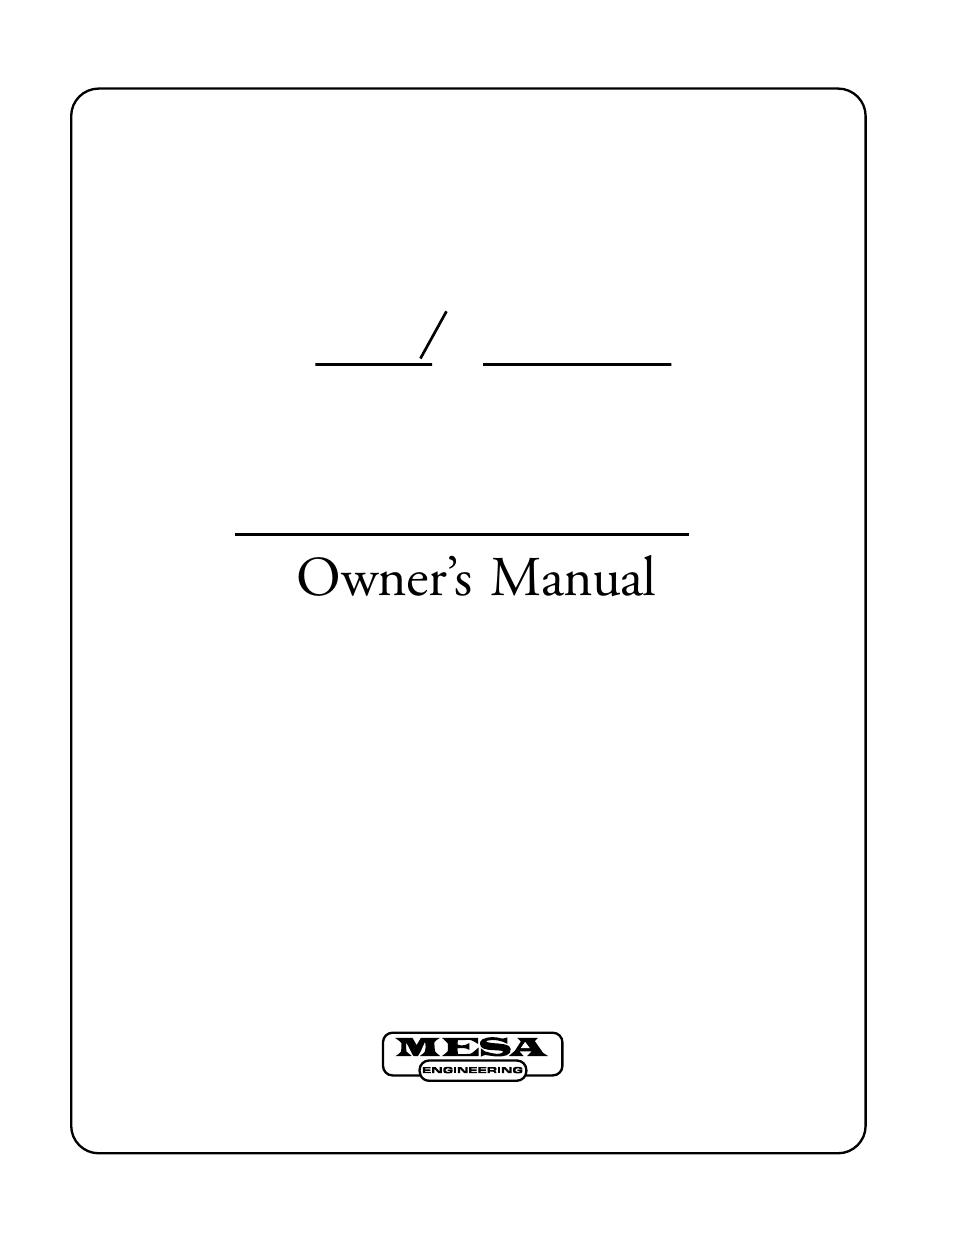 Mesa/Boogie Mark IV Amplifier User Manual   29 pages on mesa boogie mark iv combo, mesa boogie mark iv settings, mesa boogie mark iv tubes, mesa boogie mark iv pcb,